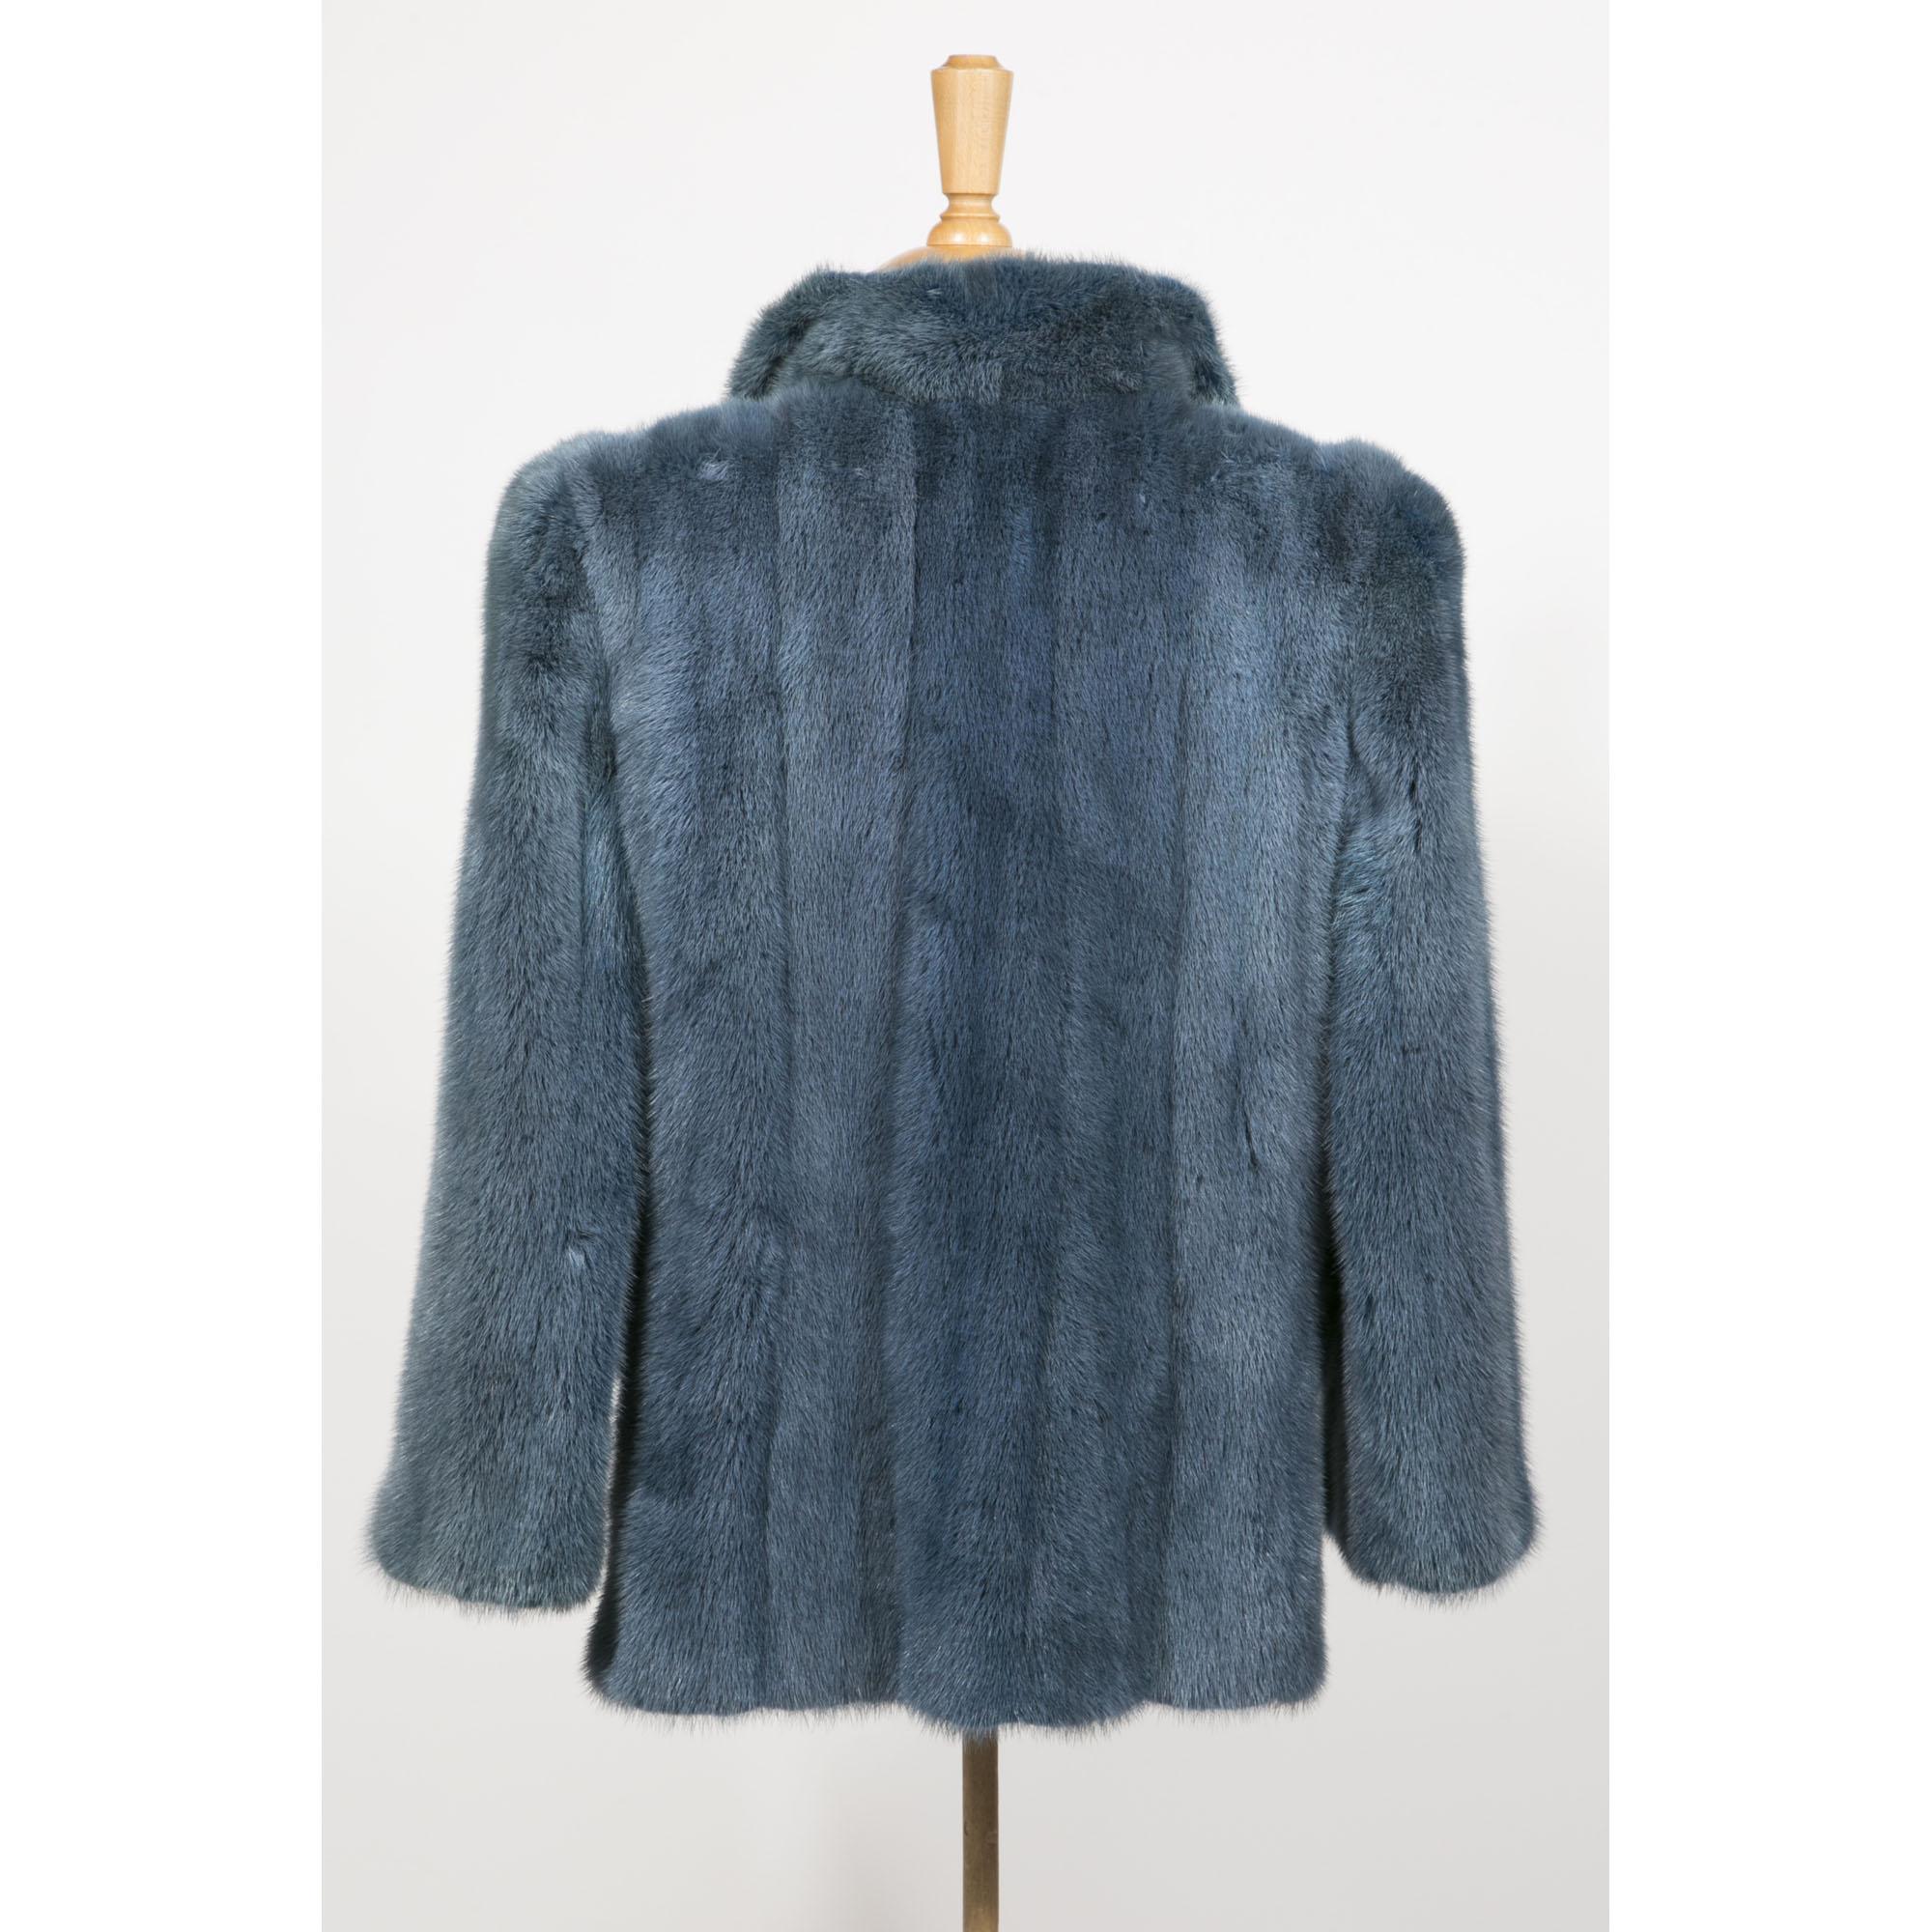 andr sauzaie veste en vison bleu vintage fashion paris. Black Bedroom Furniture Sets. Home Design Ideas